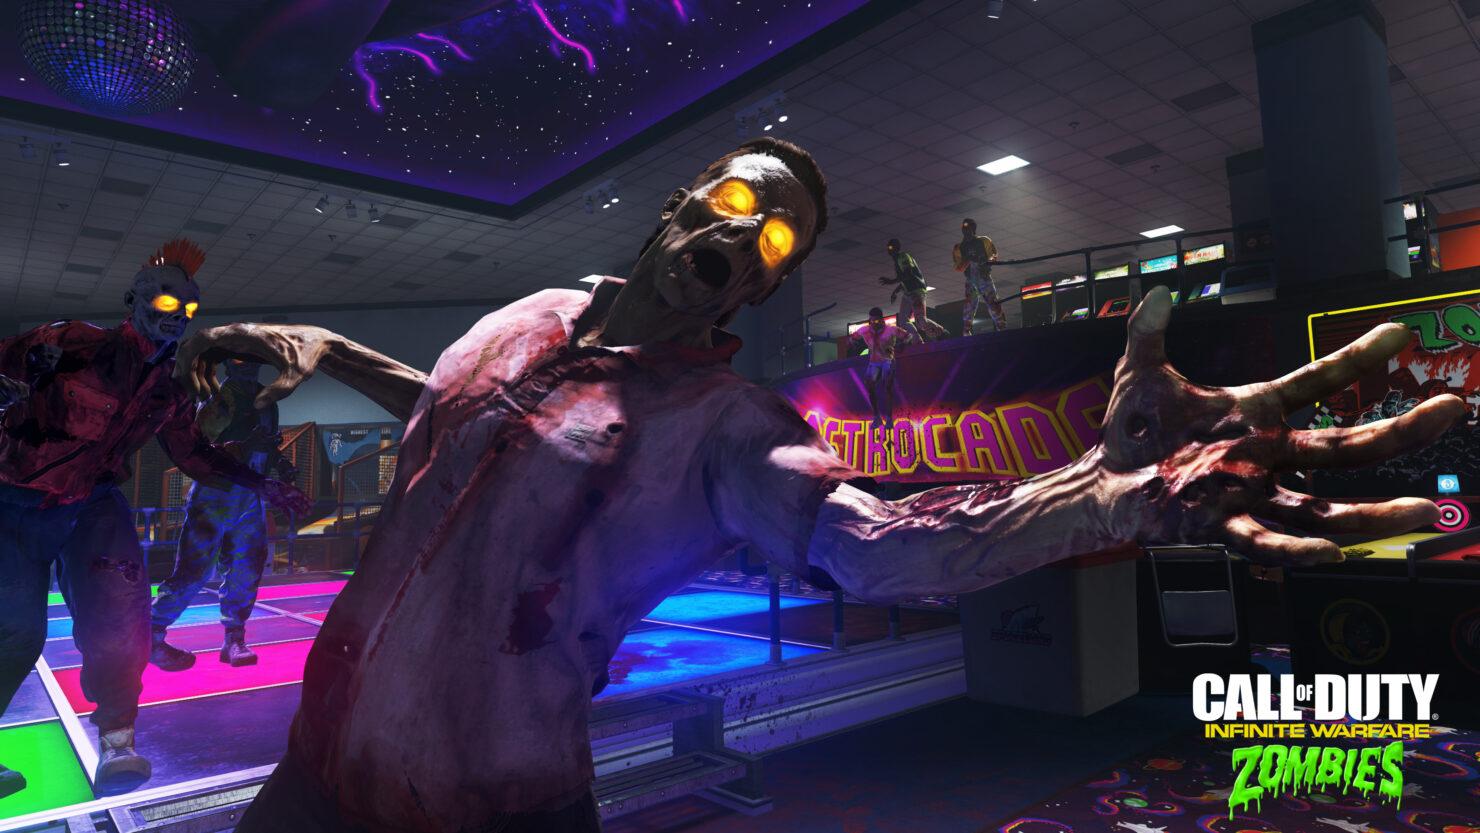 cod-infinite-warfare_zombies-in-spaceland-3_wm